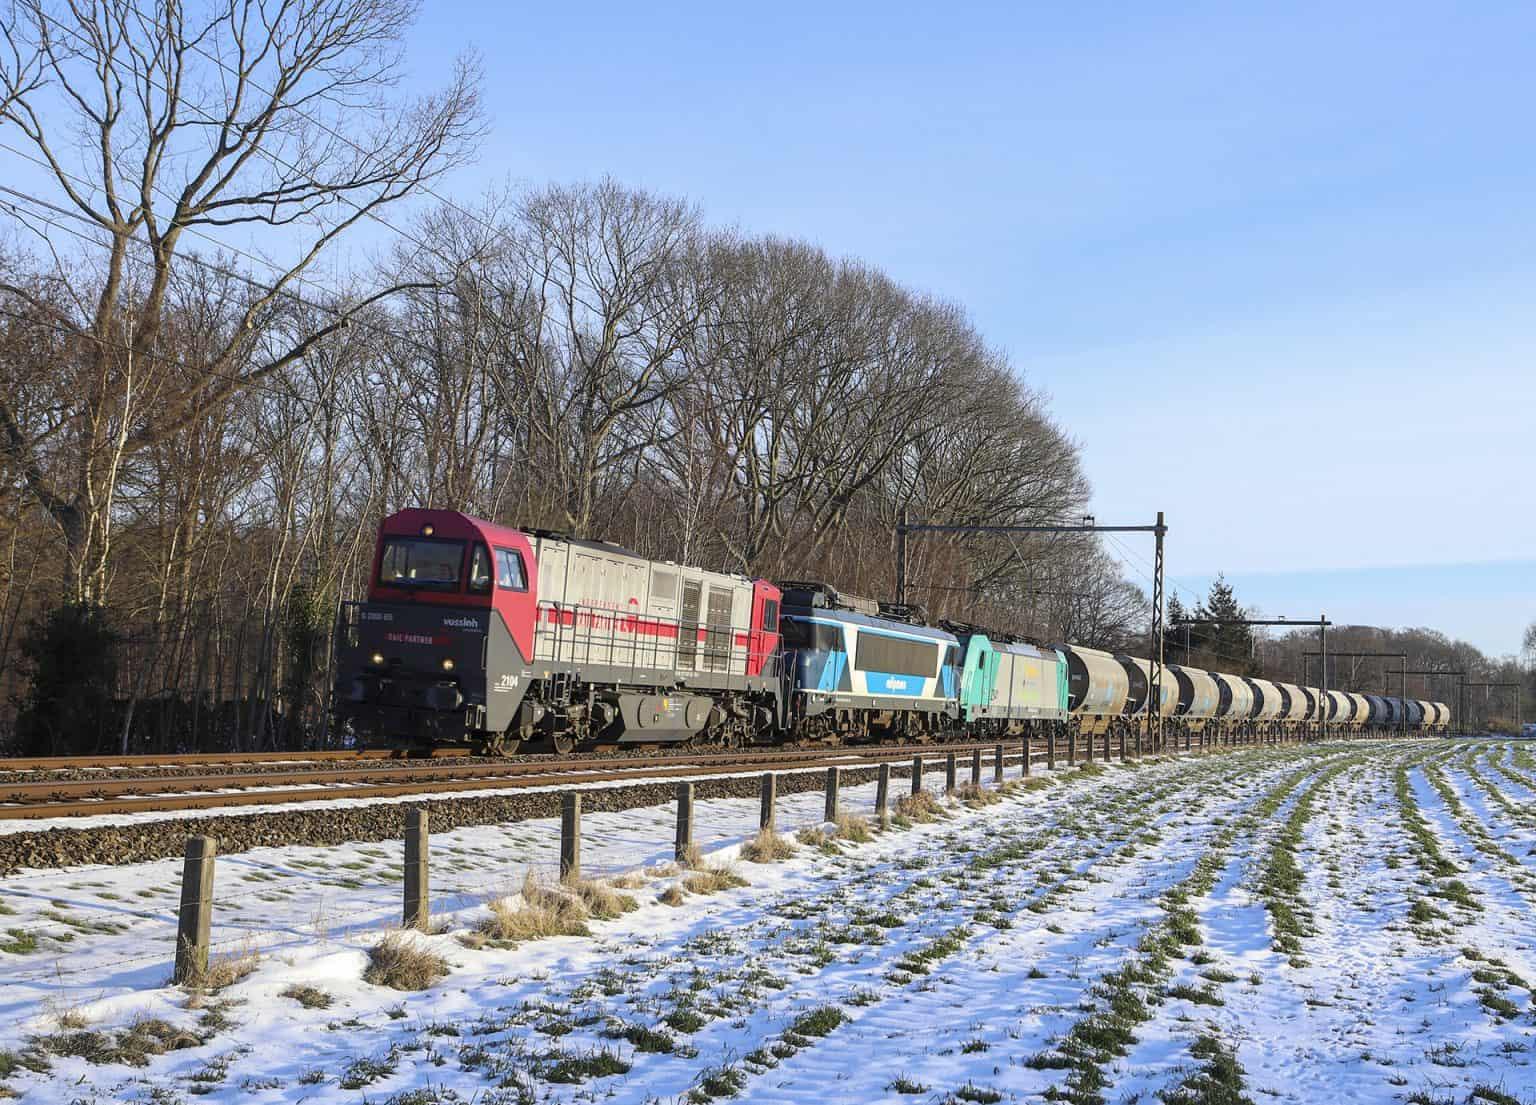 IRP 2104 + TCS 101001 _ Lineas 2841 als lege dolimetrein 47627 in Nijkerk, 14-02-2021.-GF